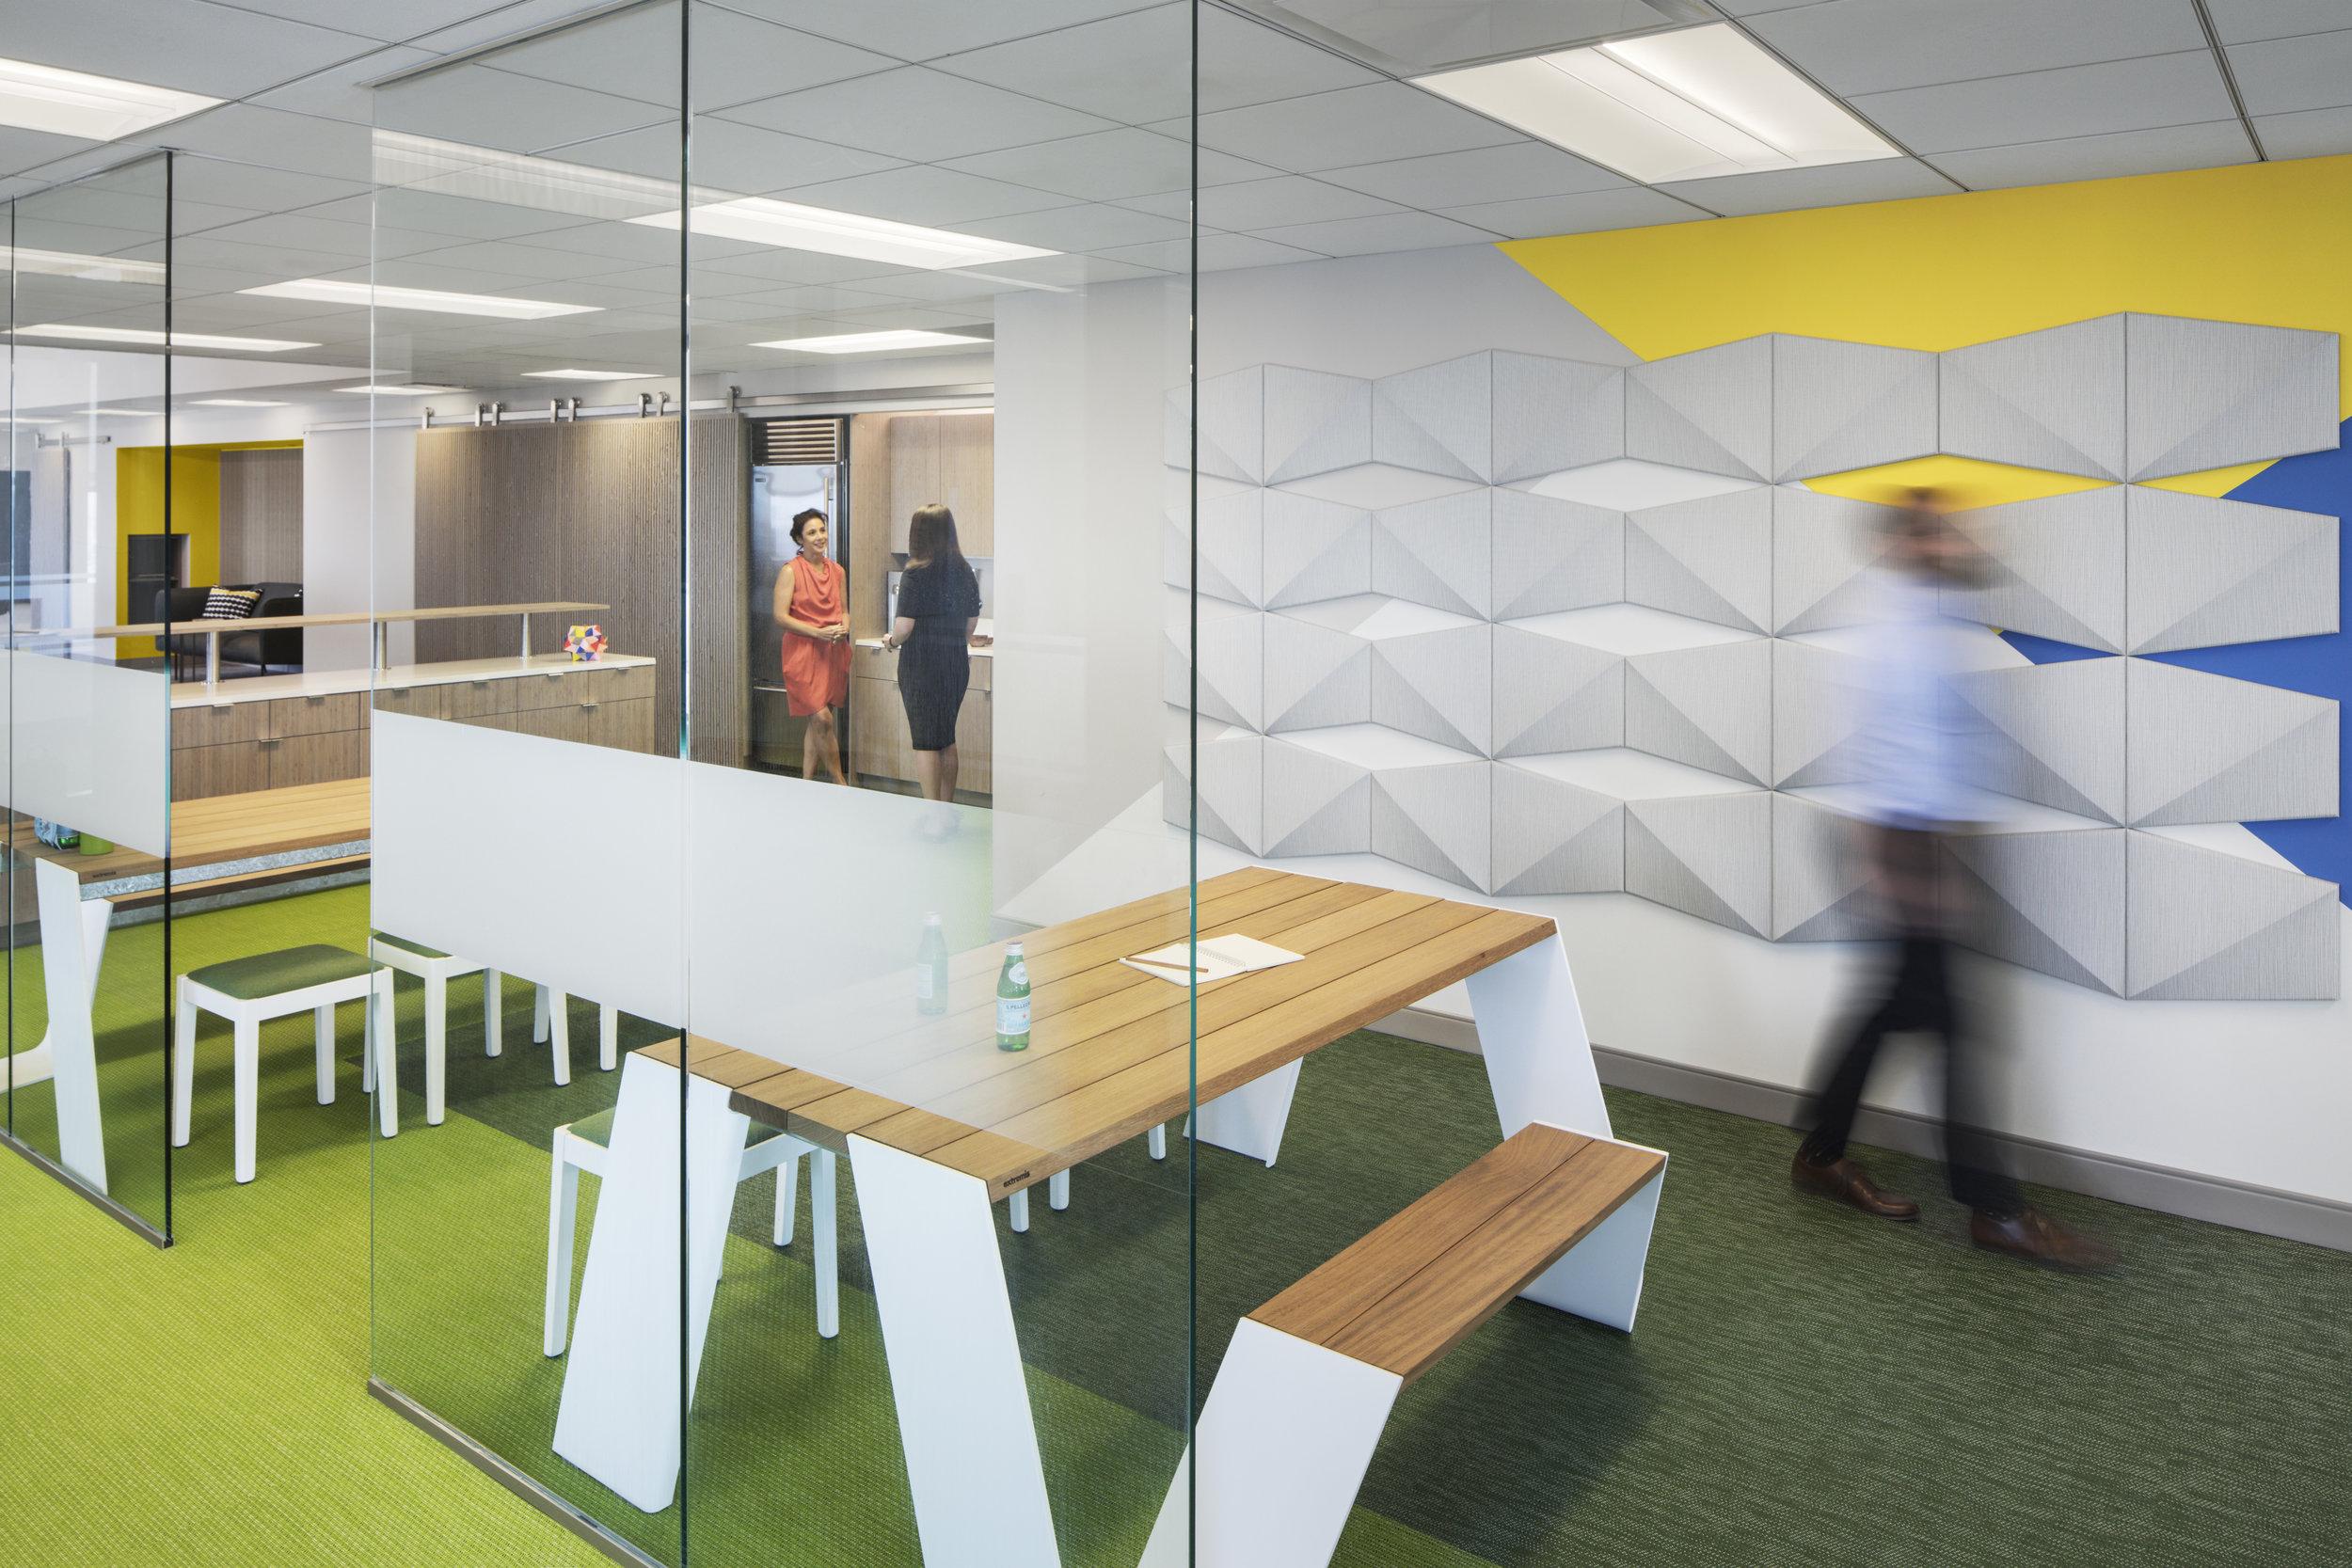 Aimco-Empire-State-Building-Lime-Green-Floor-Picnic-Bench-JMorrisDesign-Brooklyn-Interior-Designer.jpg